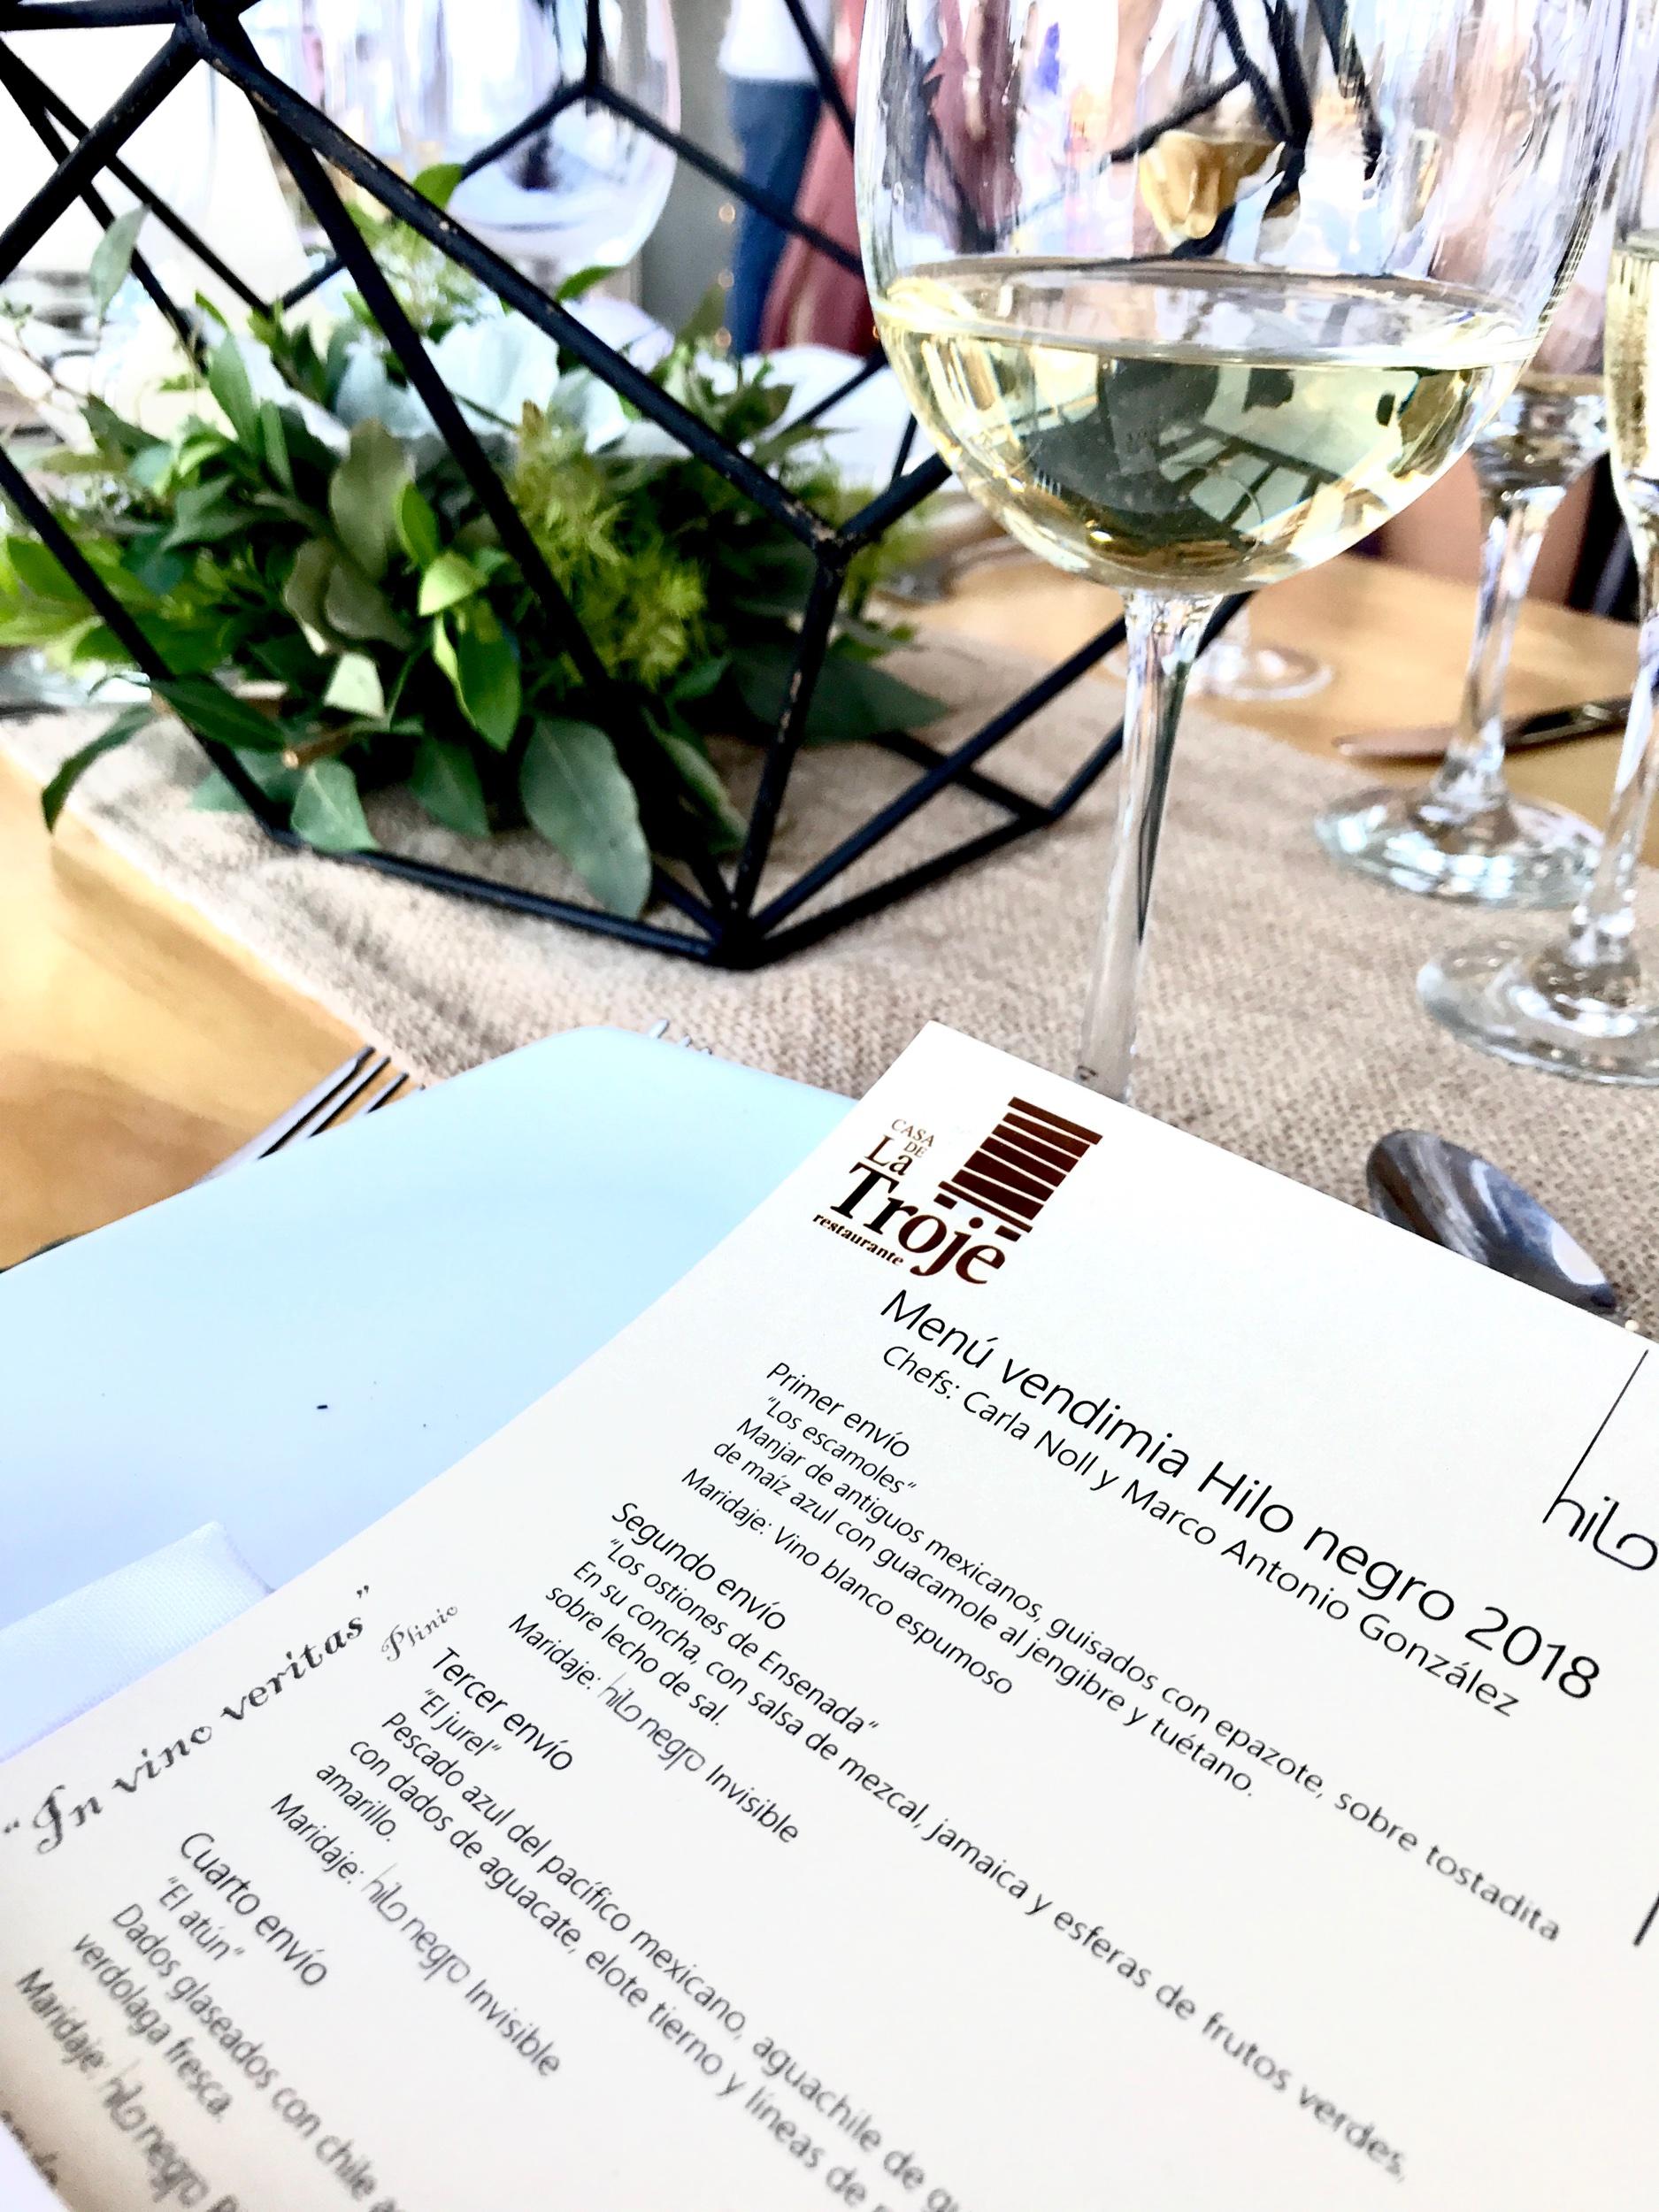 El Troje Restaurant with Hilo Negro